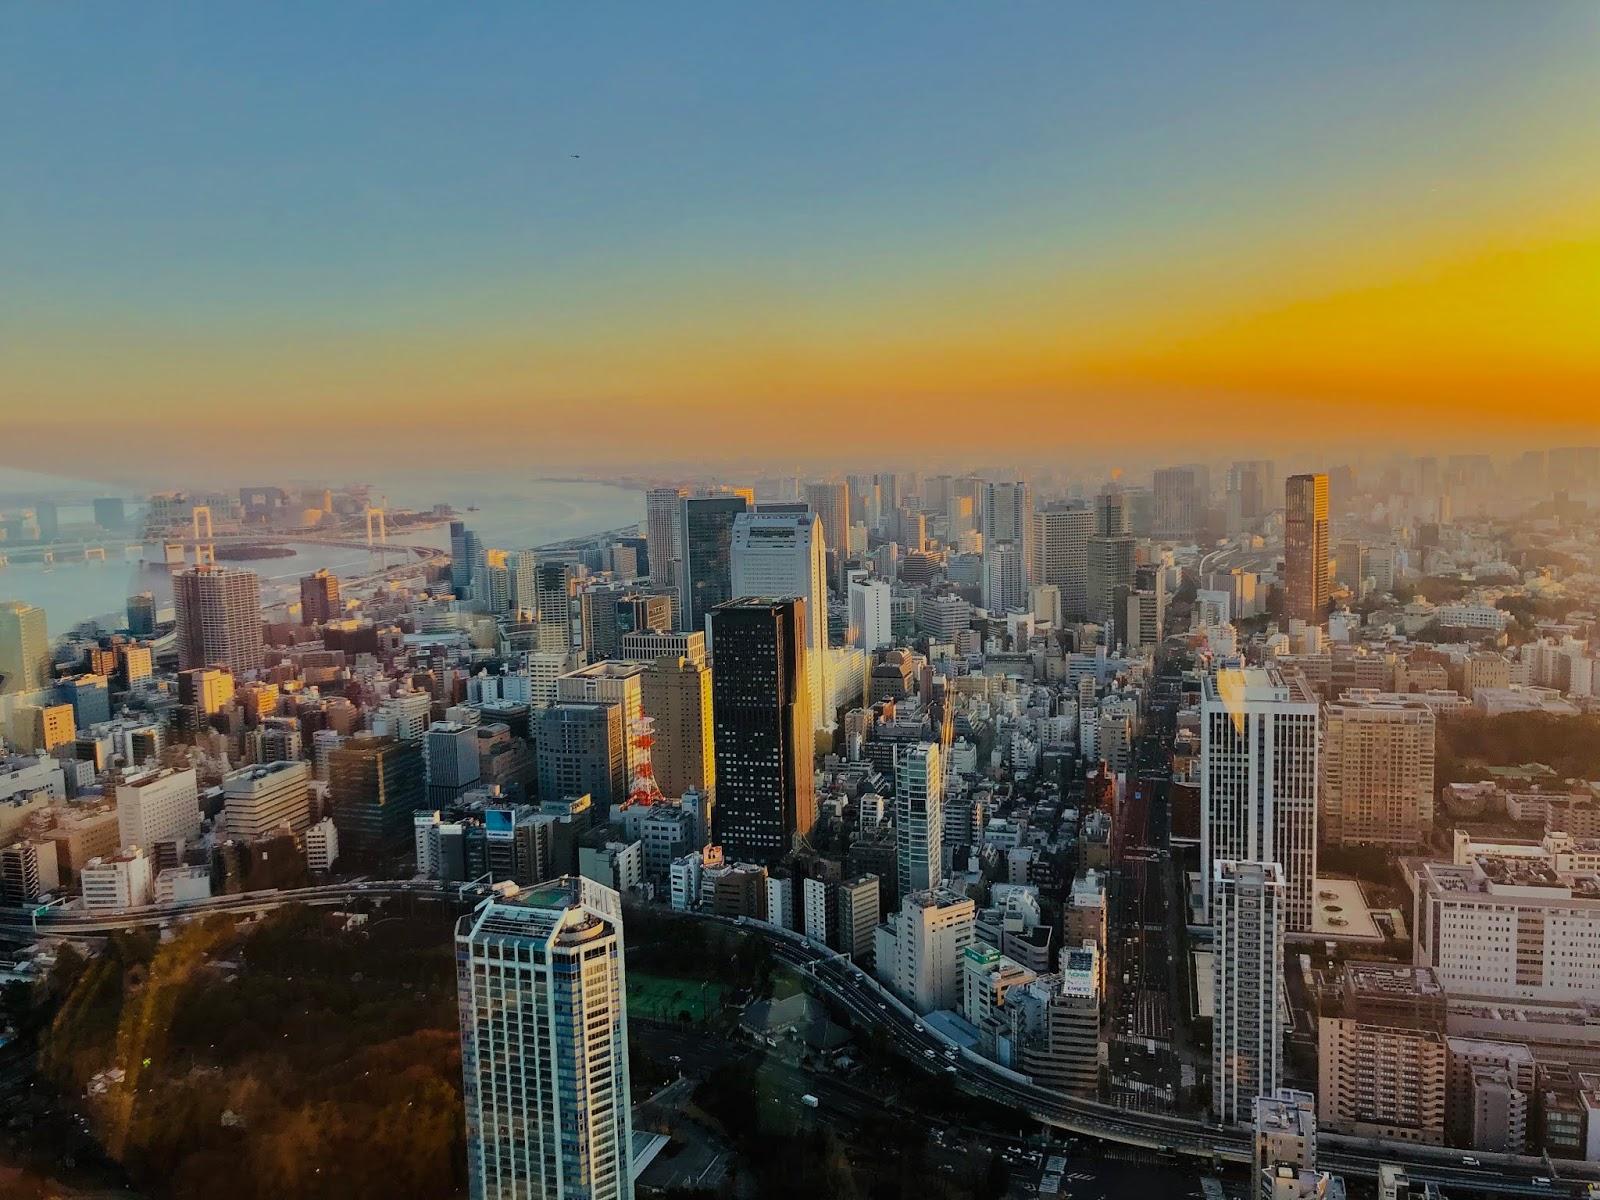 MY TRIP TO JAPAN: JANUARY 2020